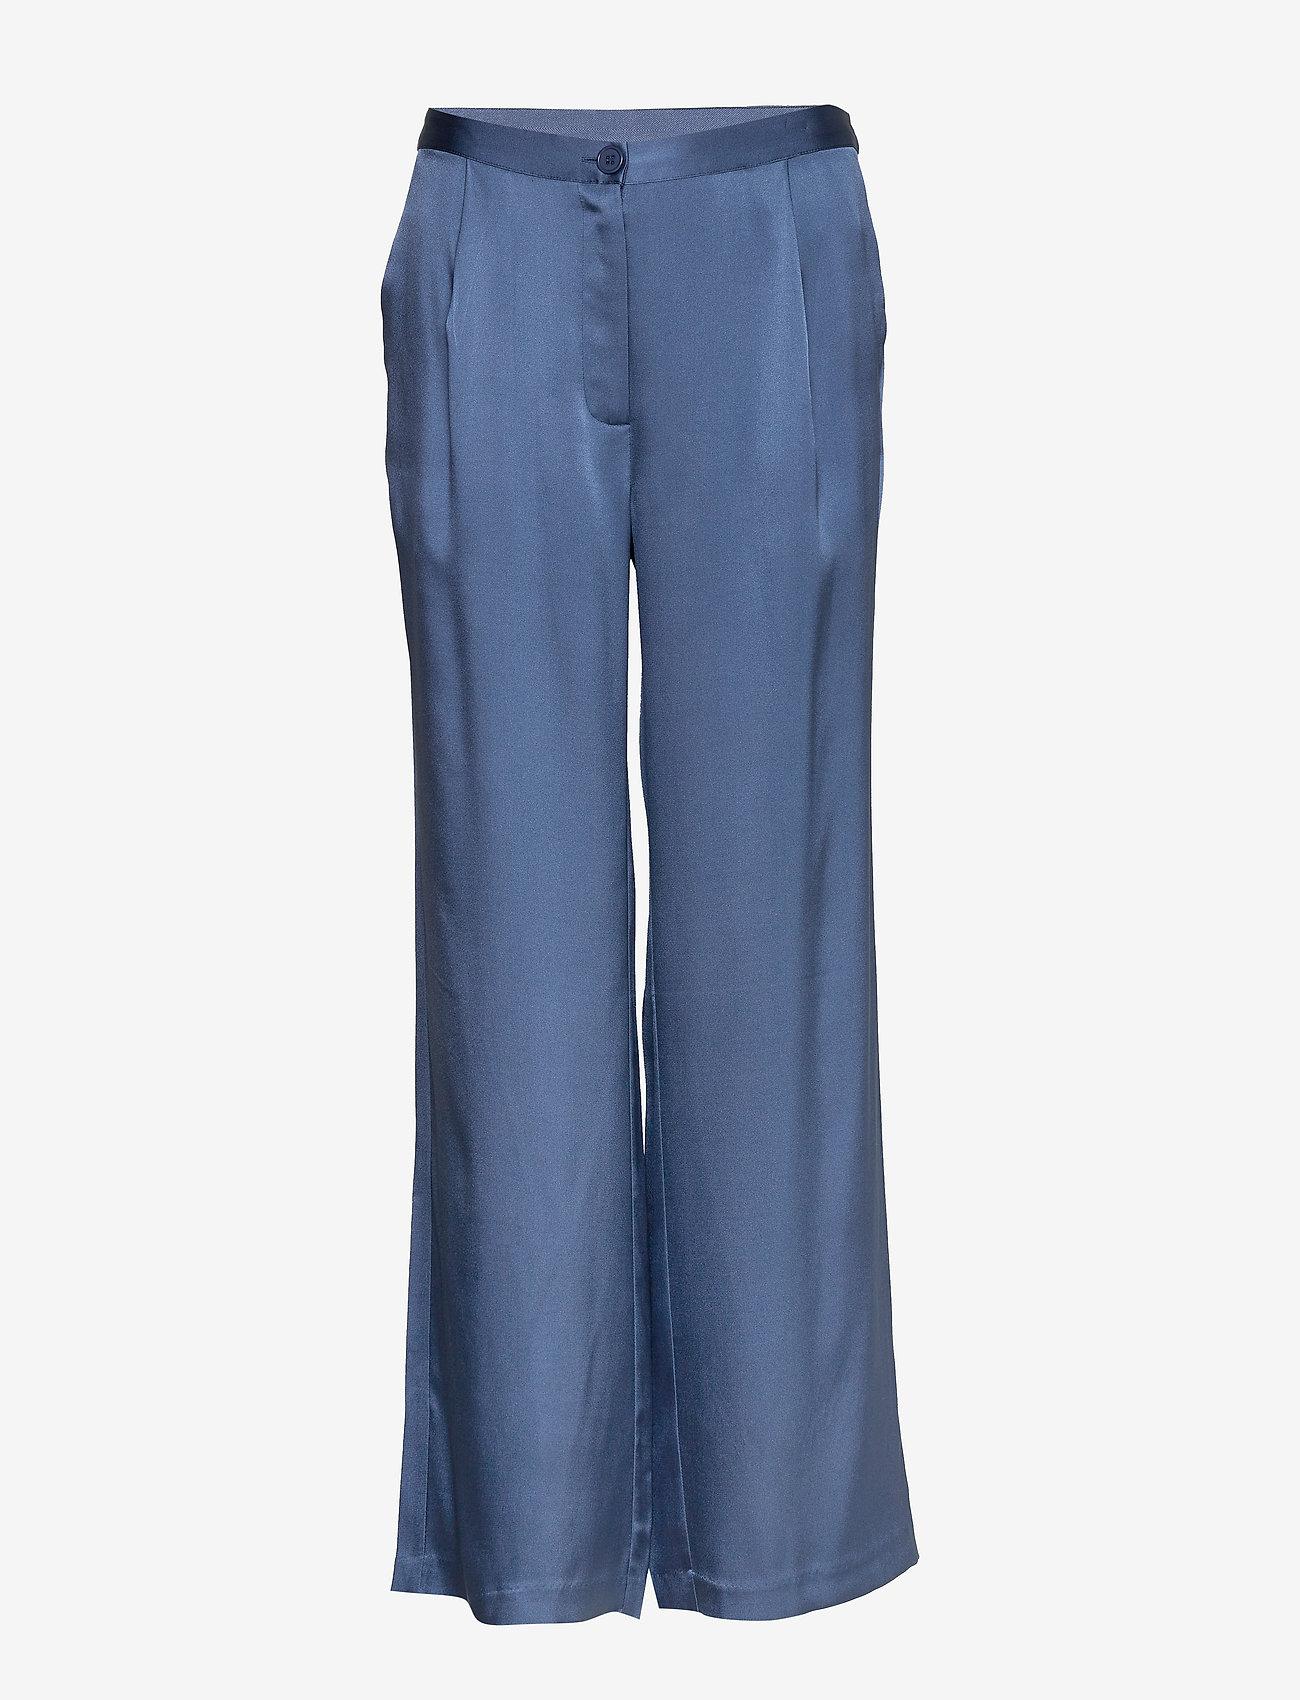 SAND - Double Silk - Sasha Flex Pleated - vida byxor - medium blue - 0